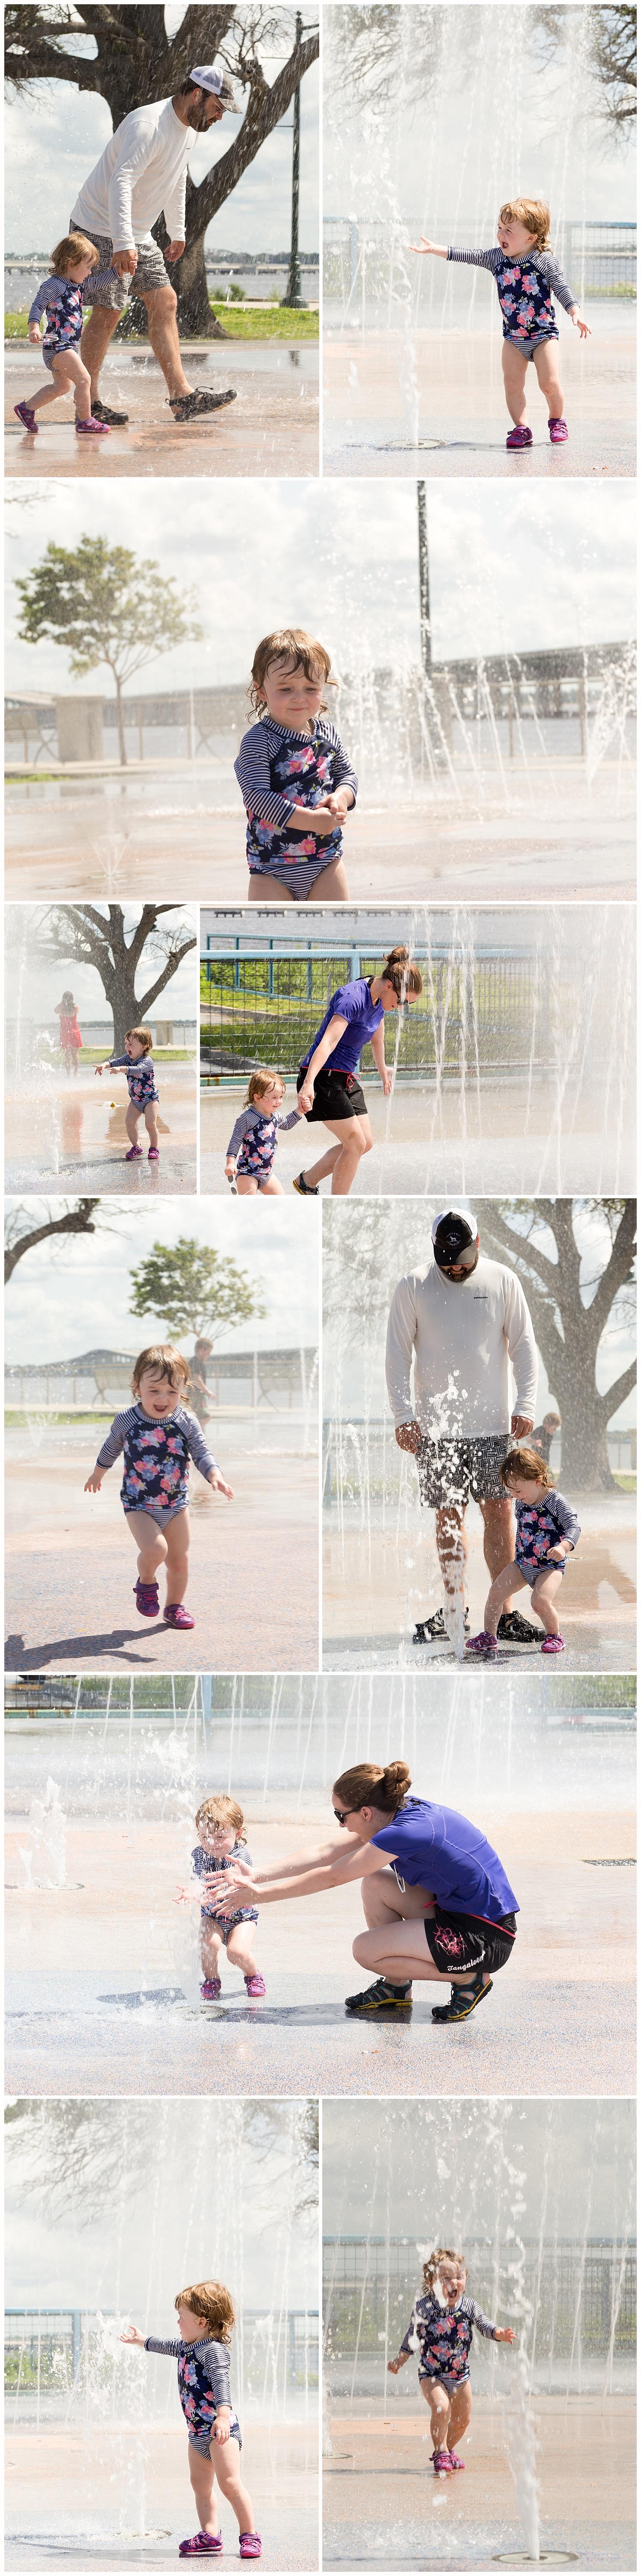 family fun in the summer, splash park in Biloxi, Mississippi